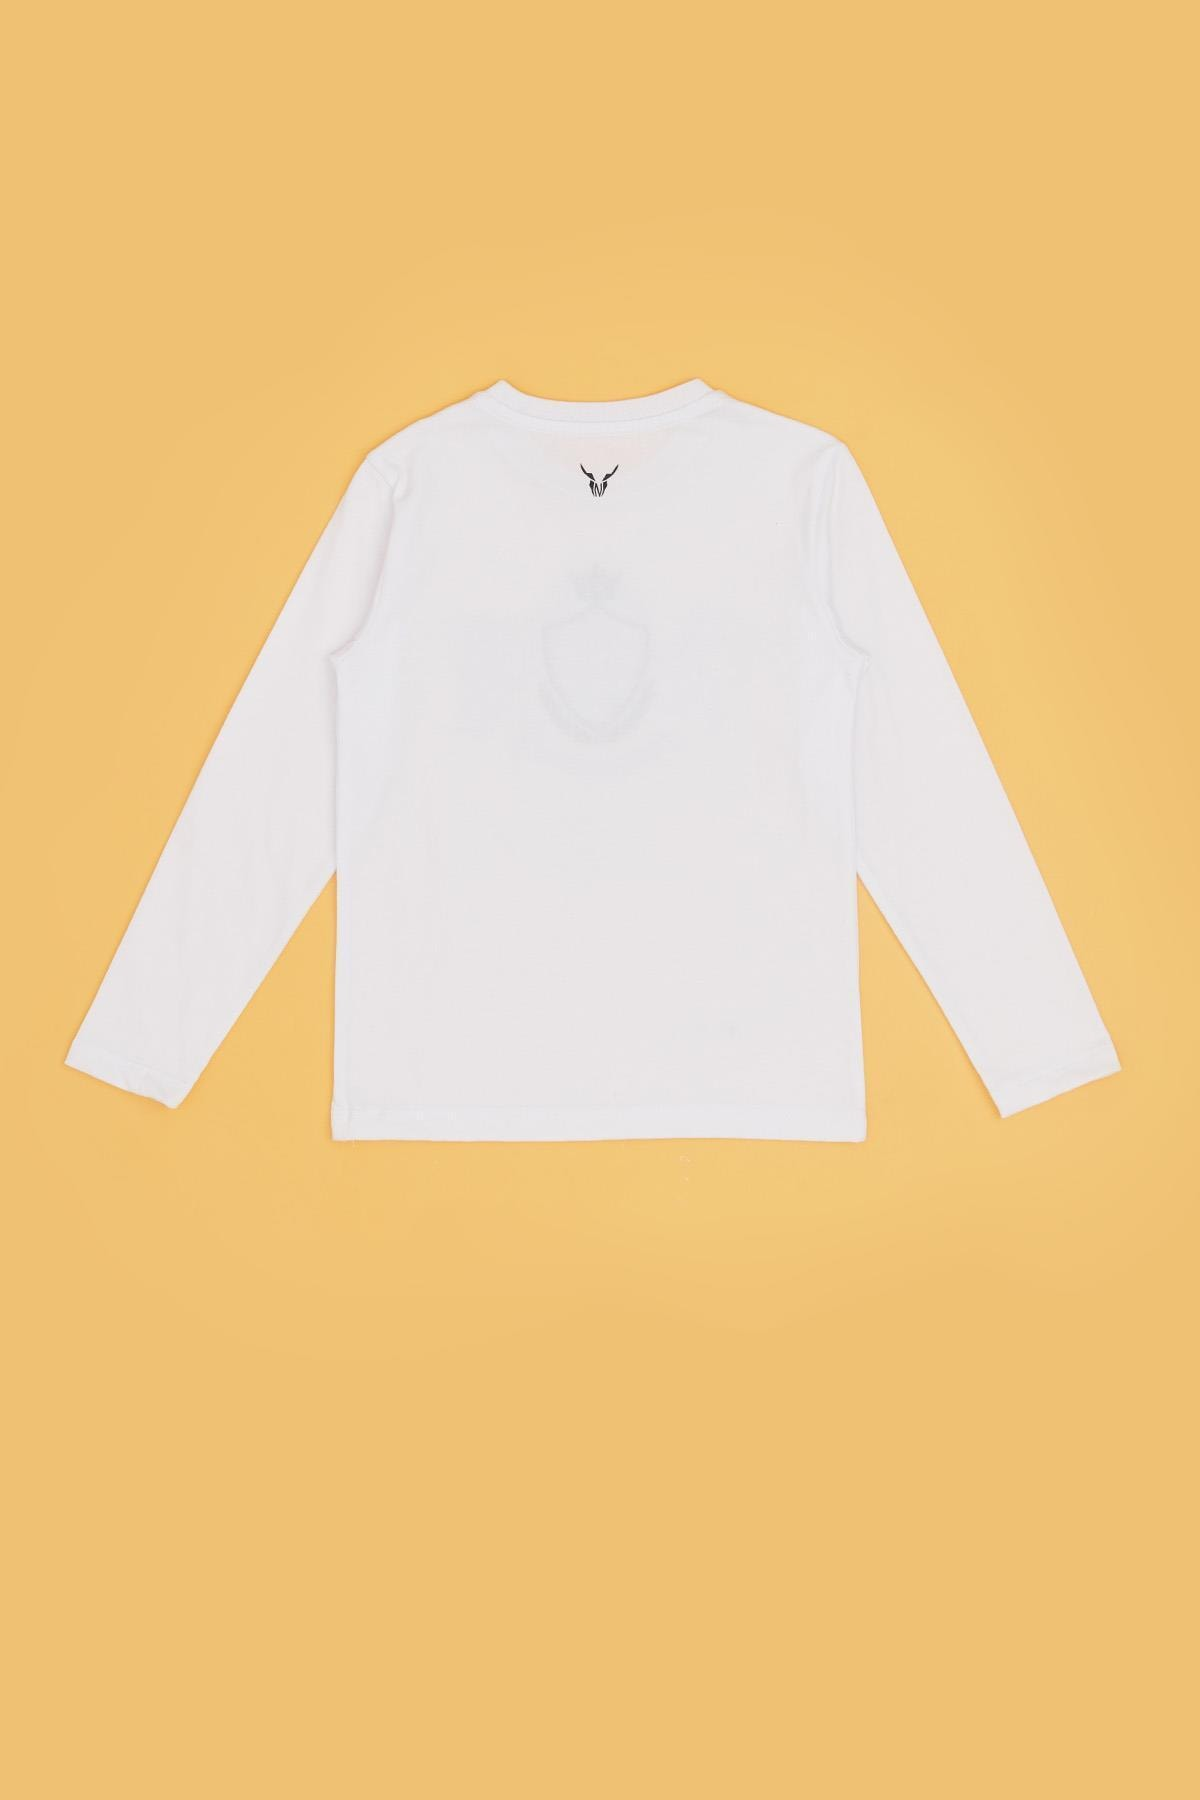 Nebbati Erkek Çocuk Beyaz T-shirt 20fw0nb3523 2